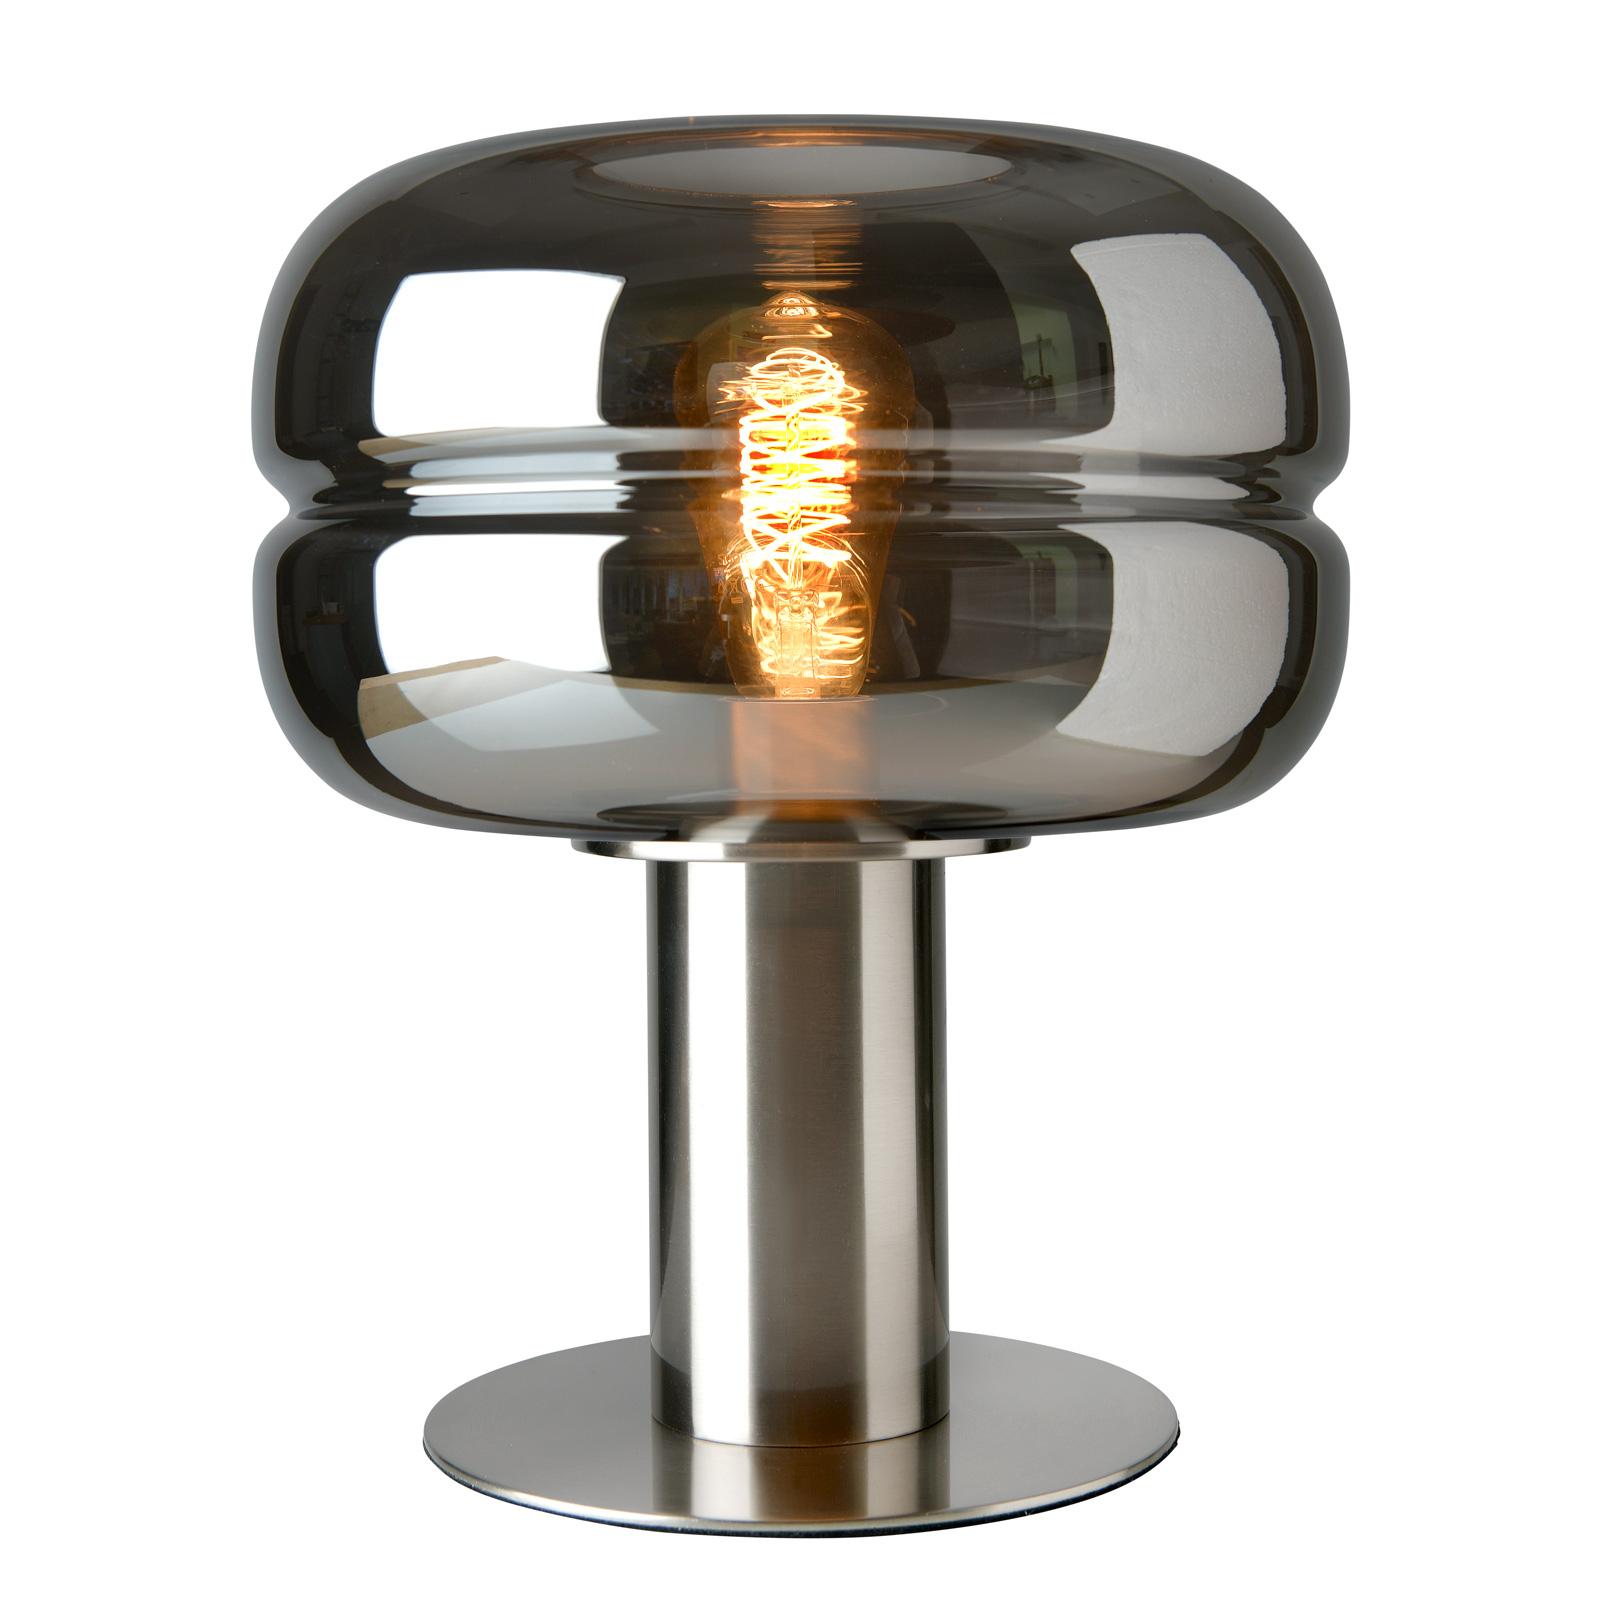 Villeroy & Boch Havanna pöytälamppu, satiini, 34cm